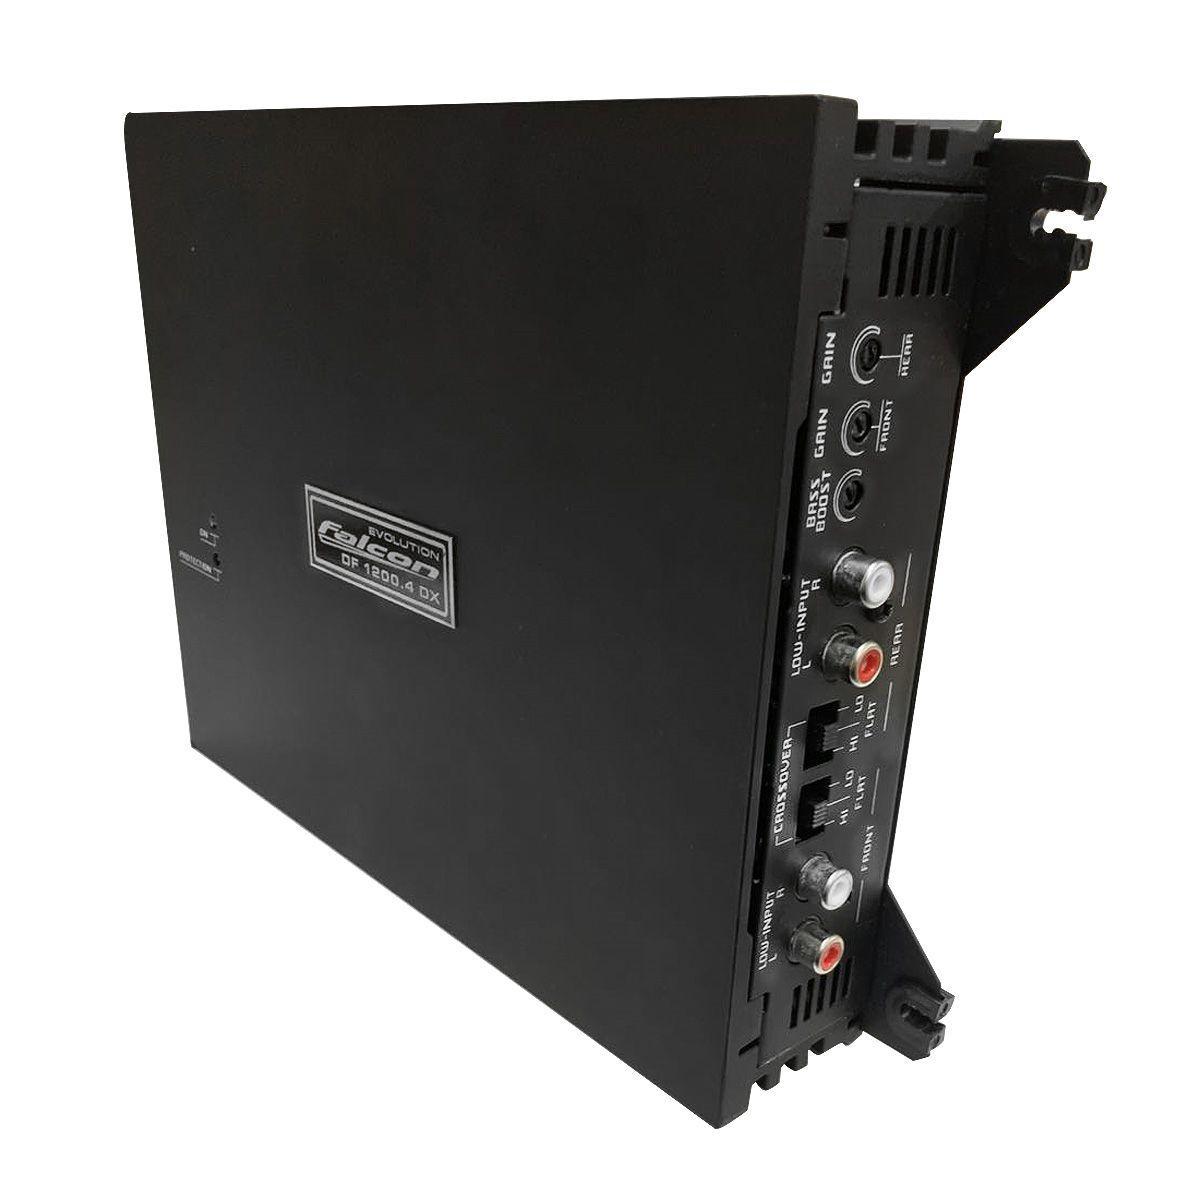 Módulo de Potência Falcon DF 1200.4DX - 4X300WRMS 2ohms configurável  4/3/2 canais RCA